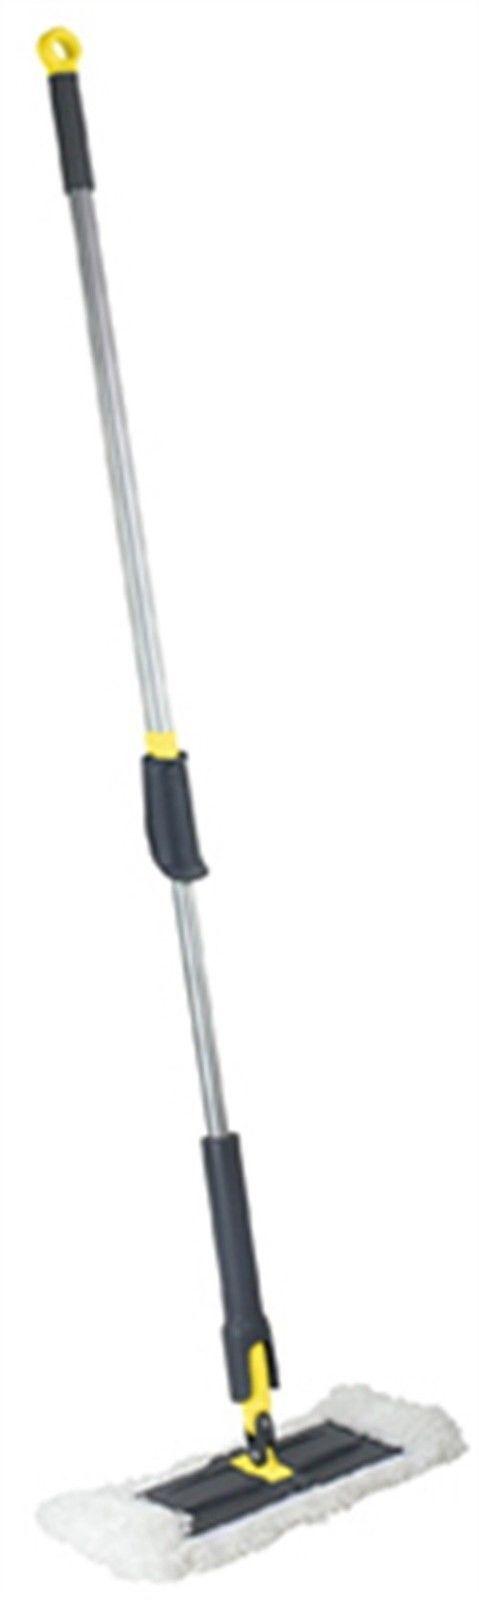 Casabella 86006 Height Adjustable Butterfly Floor Duster